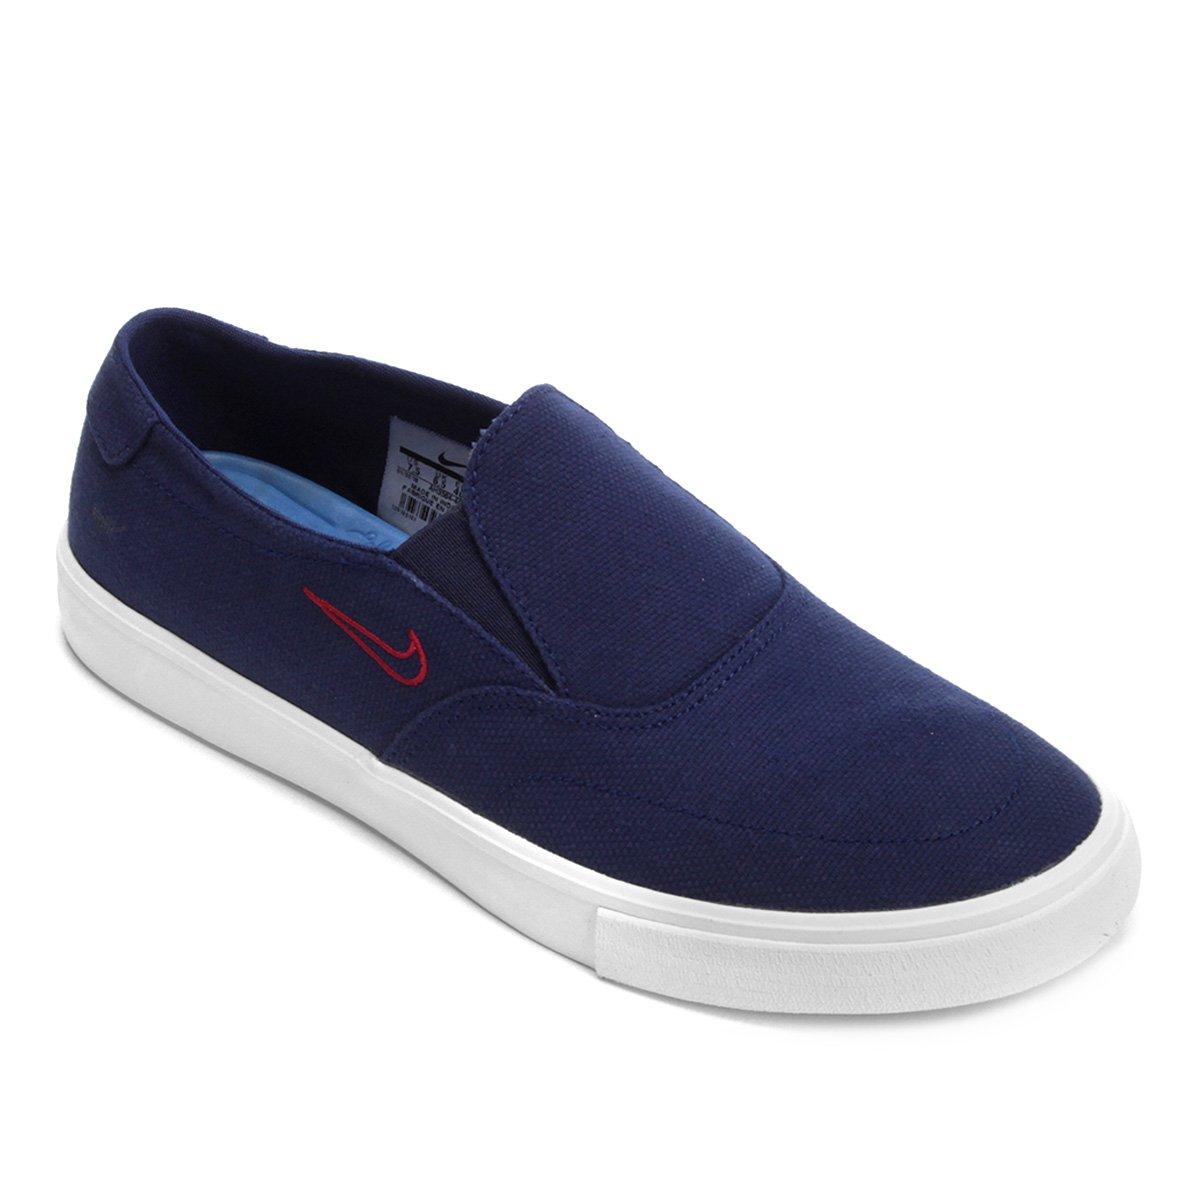 Tênis Nike SB Portmore II Solarsoft Slip Masculino - Azul - Compre ... ac9255a2c6472